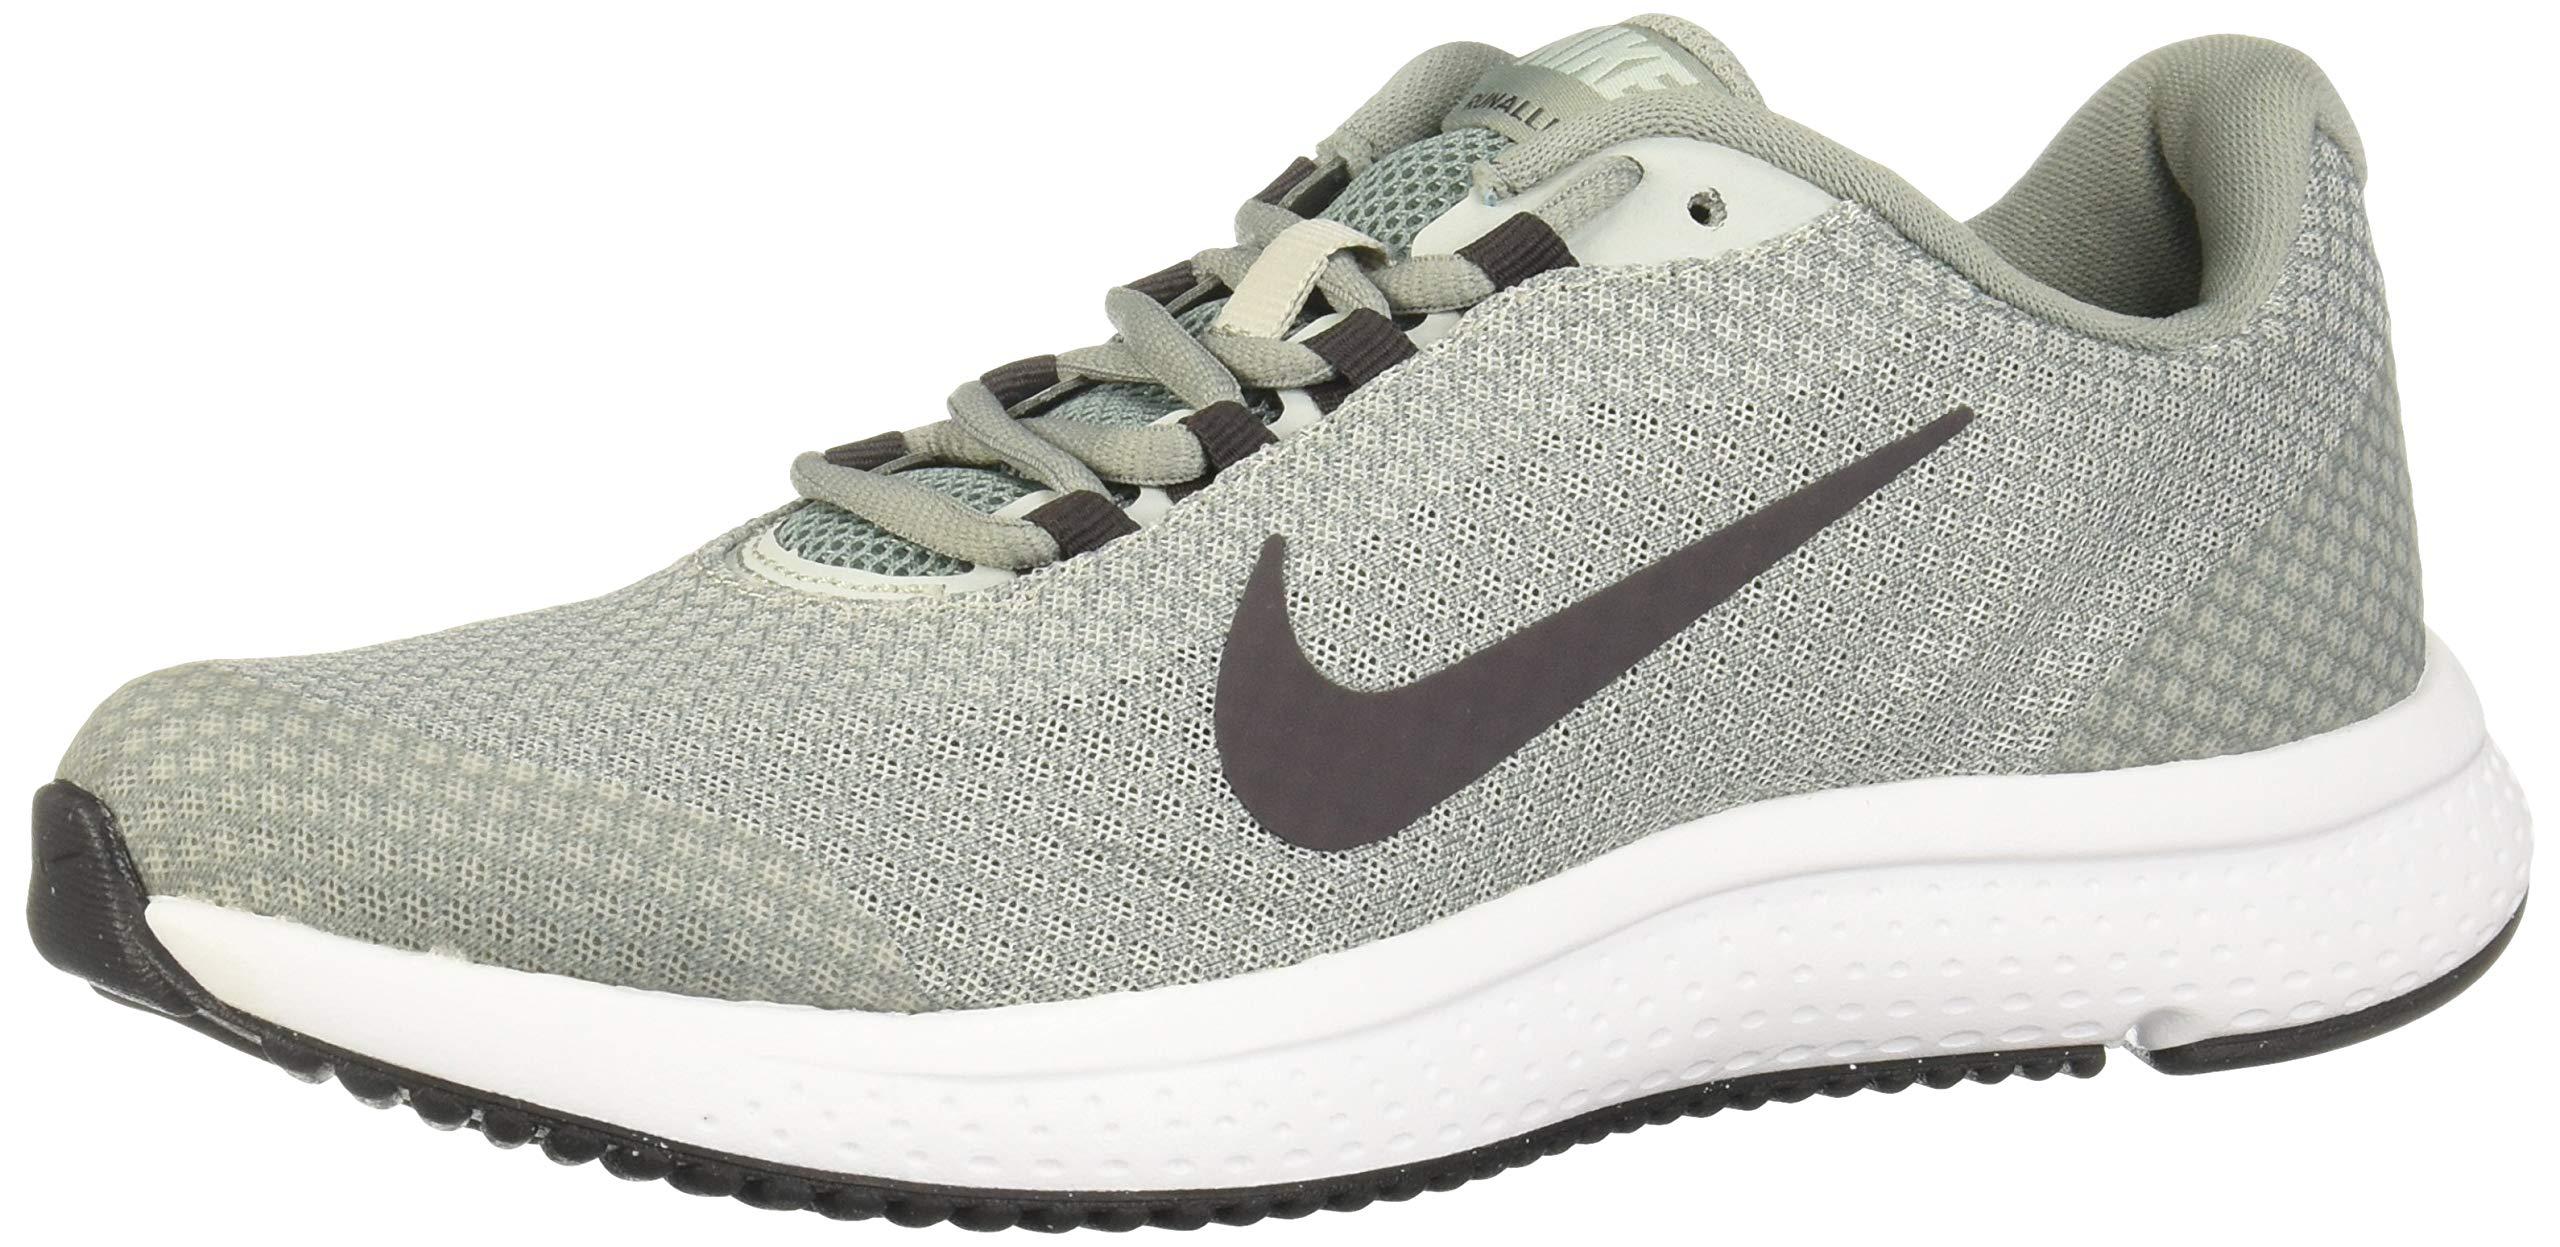 Nike Damen WMNS Runallday Laufschuhe, grau